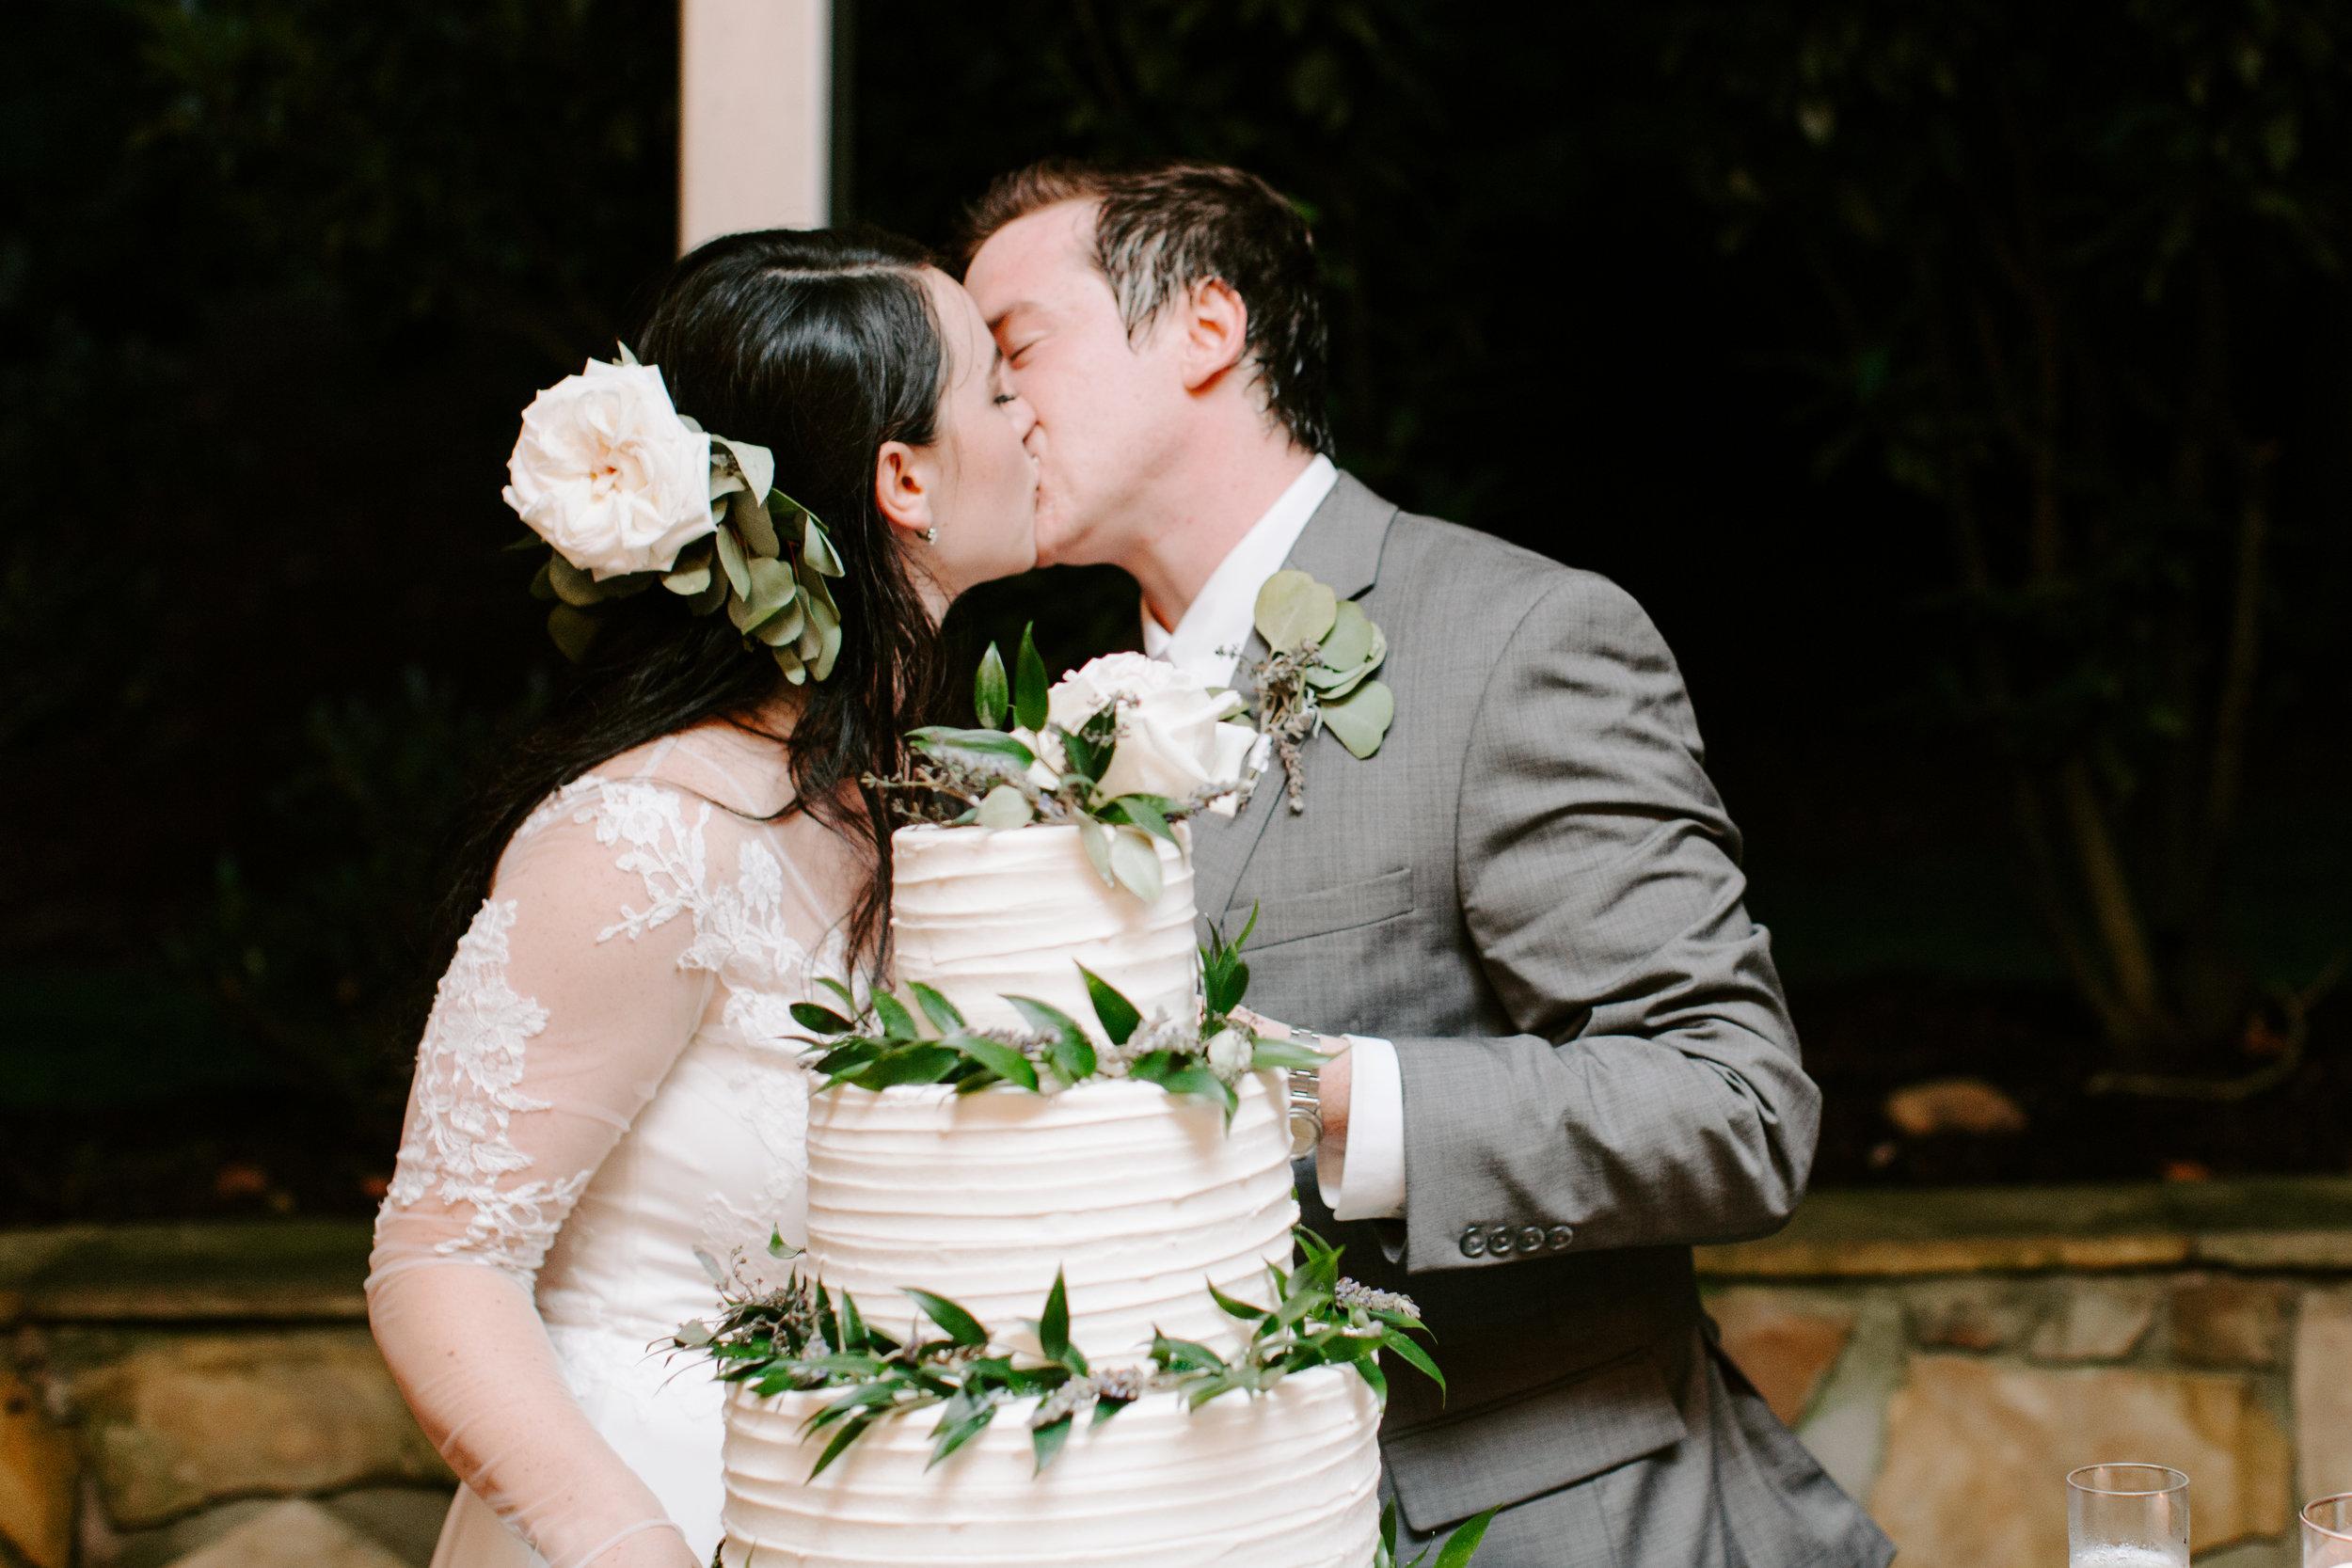 cake-cutting-kiss.jpg